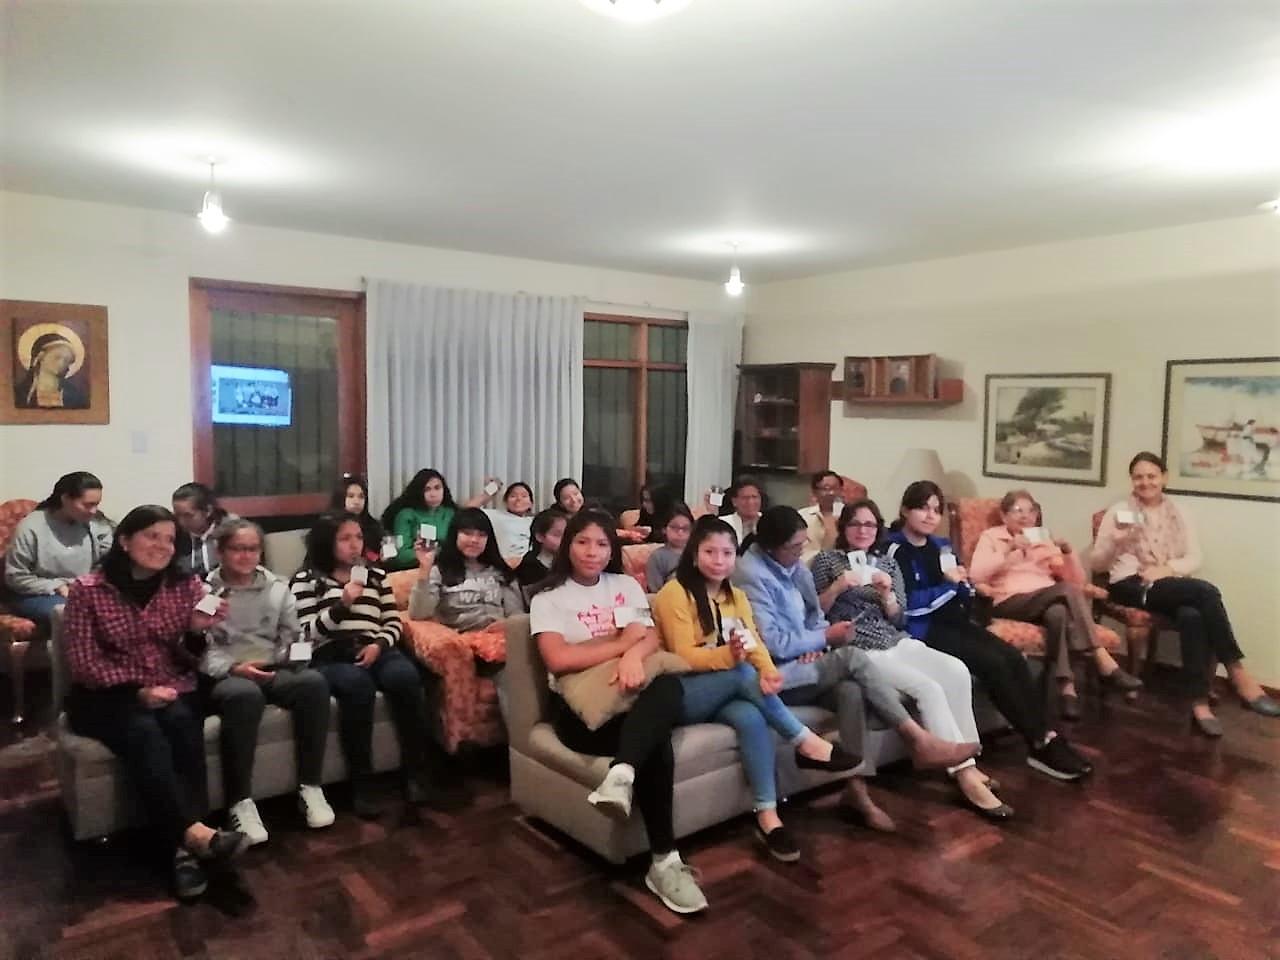 Viendo la ceremonia en la sala de estar de Ribalera